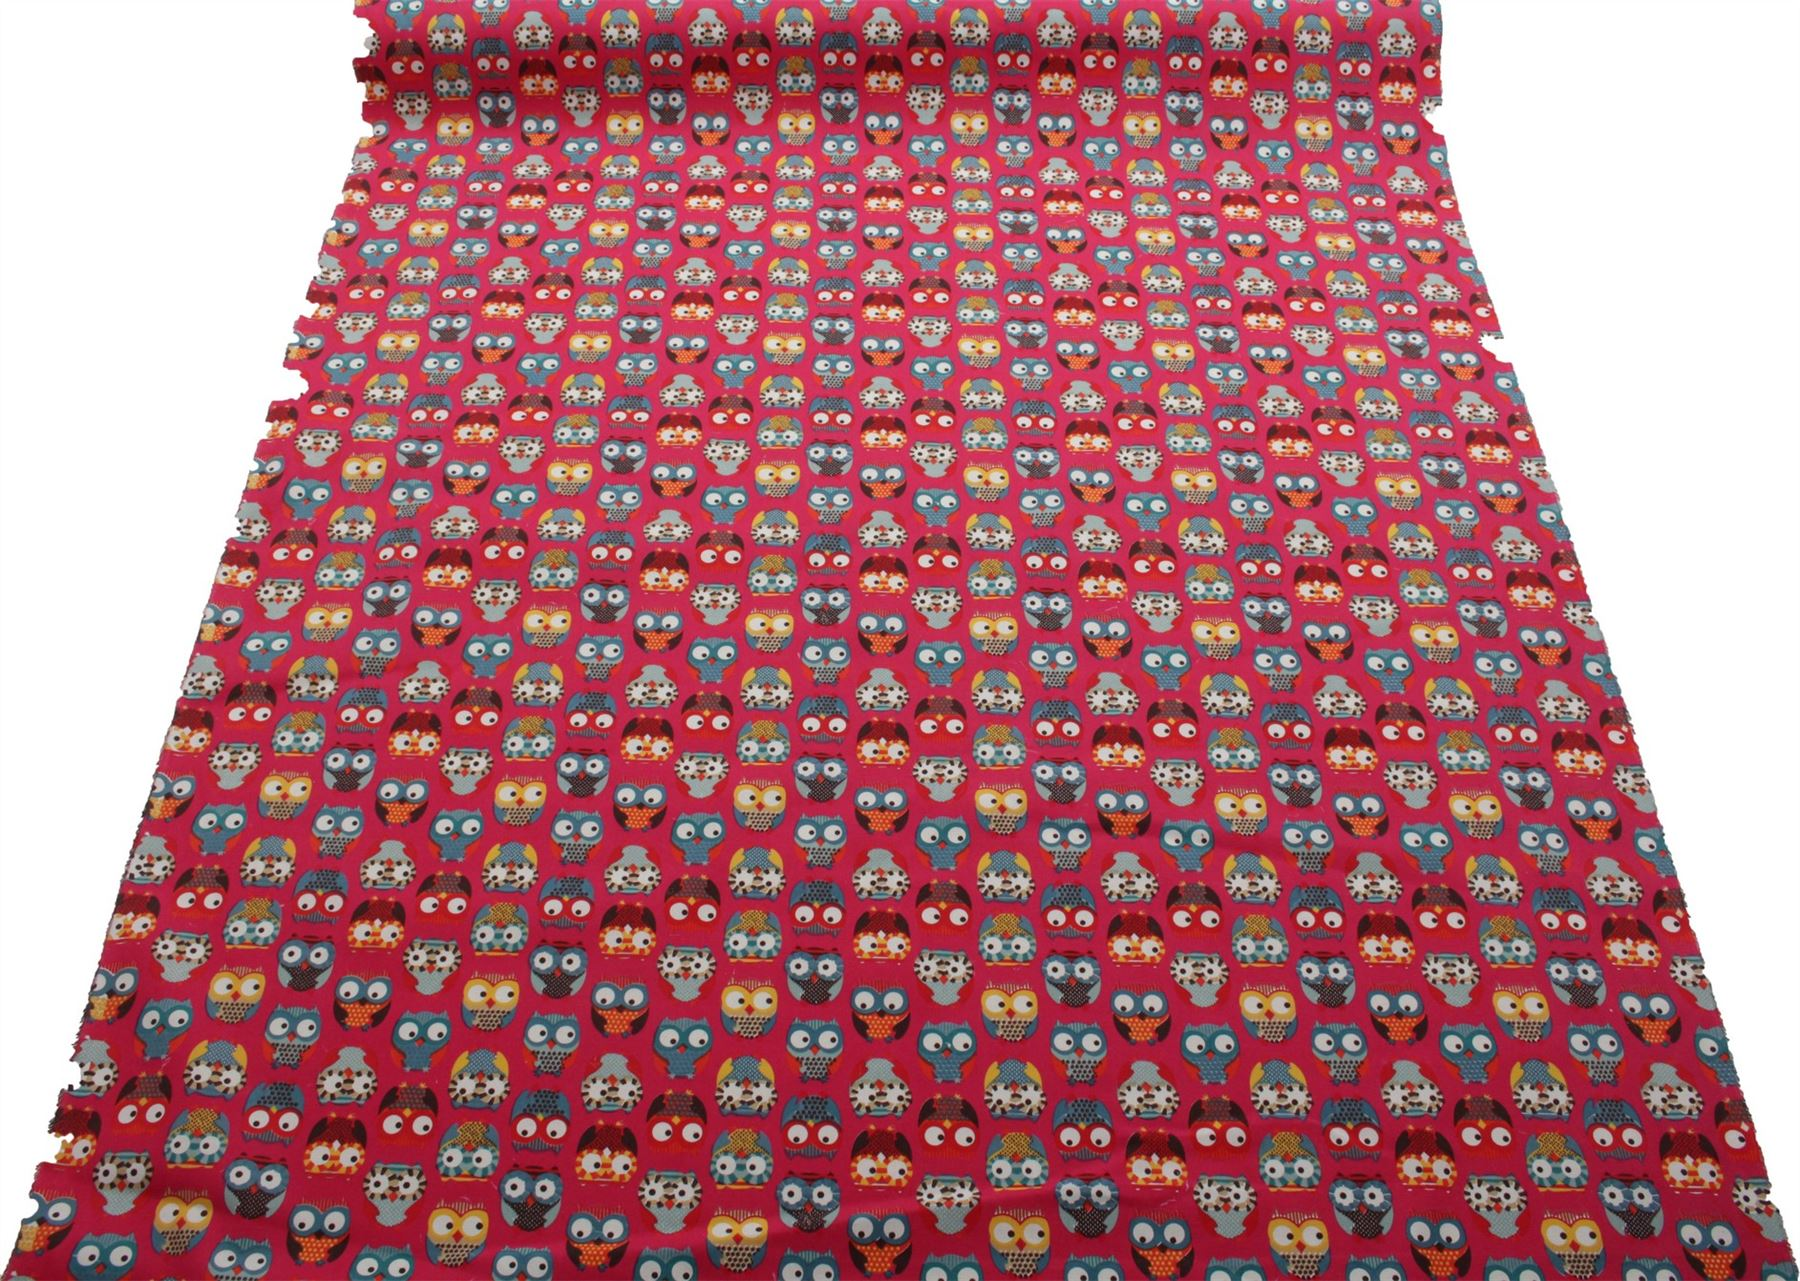 thumbnail 15 - 100% Heavy Cotton Panama Printed Childrens Curtain Cushion Upholstery Fabric